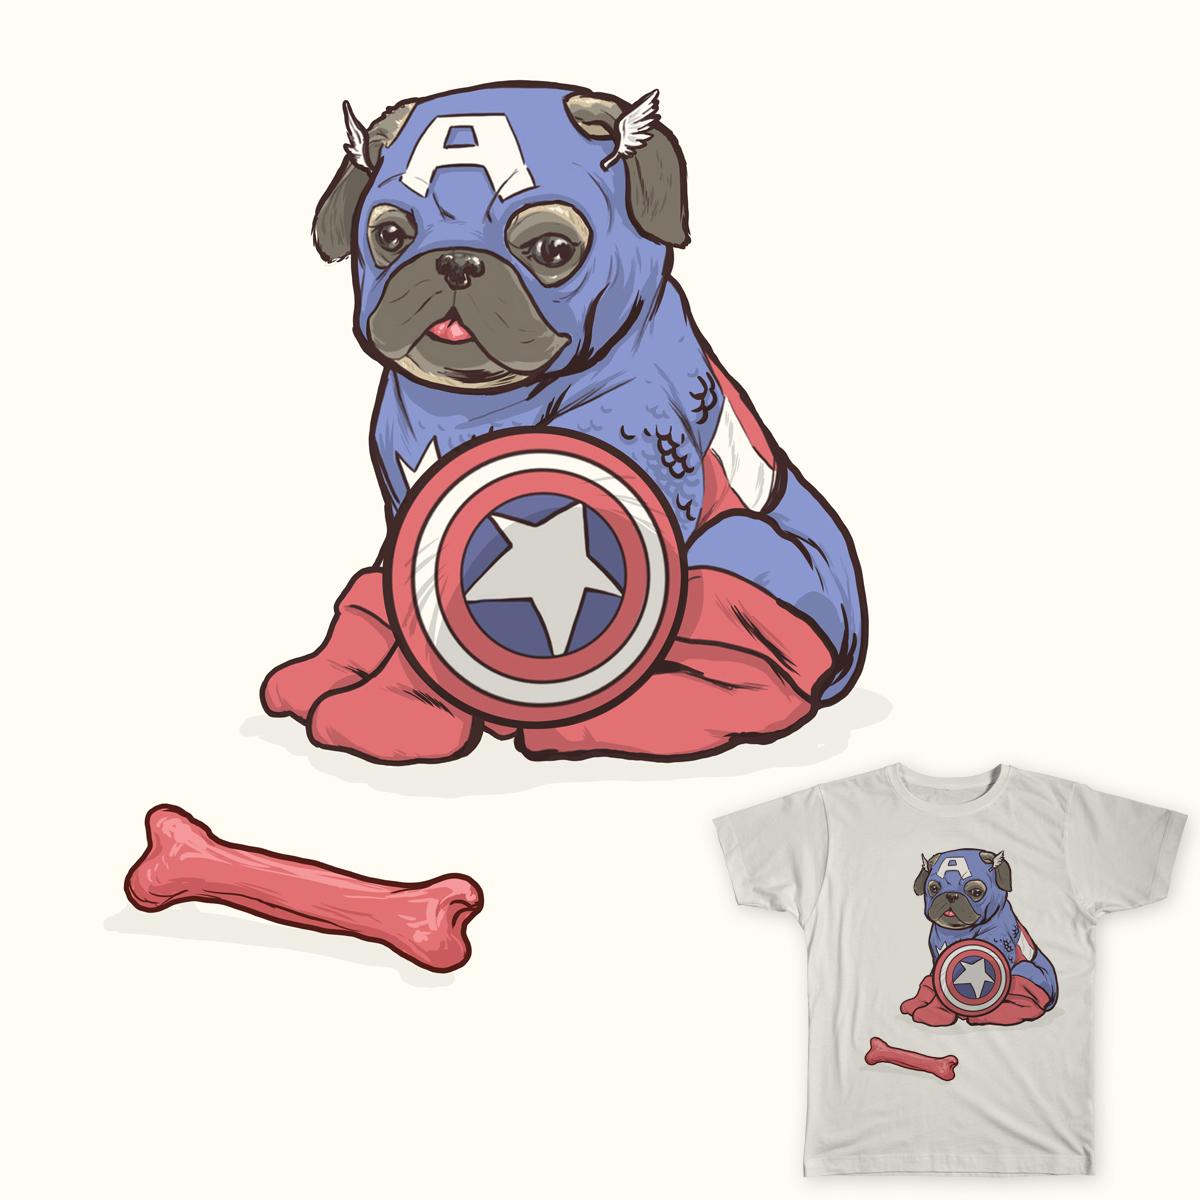 All American Dog by Josh_Sketchy on Threadless